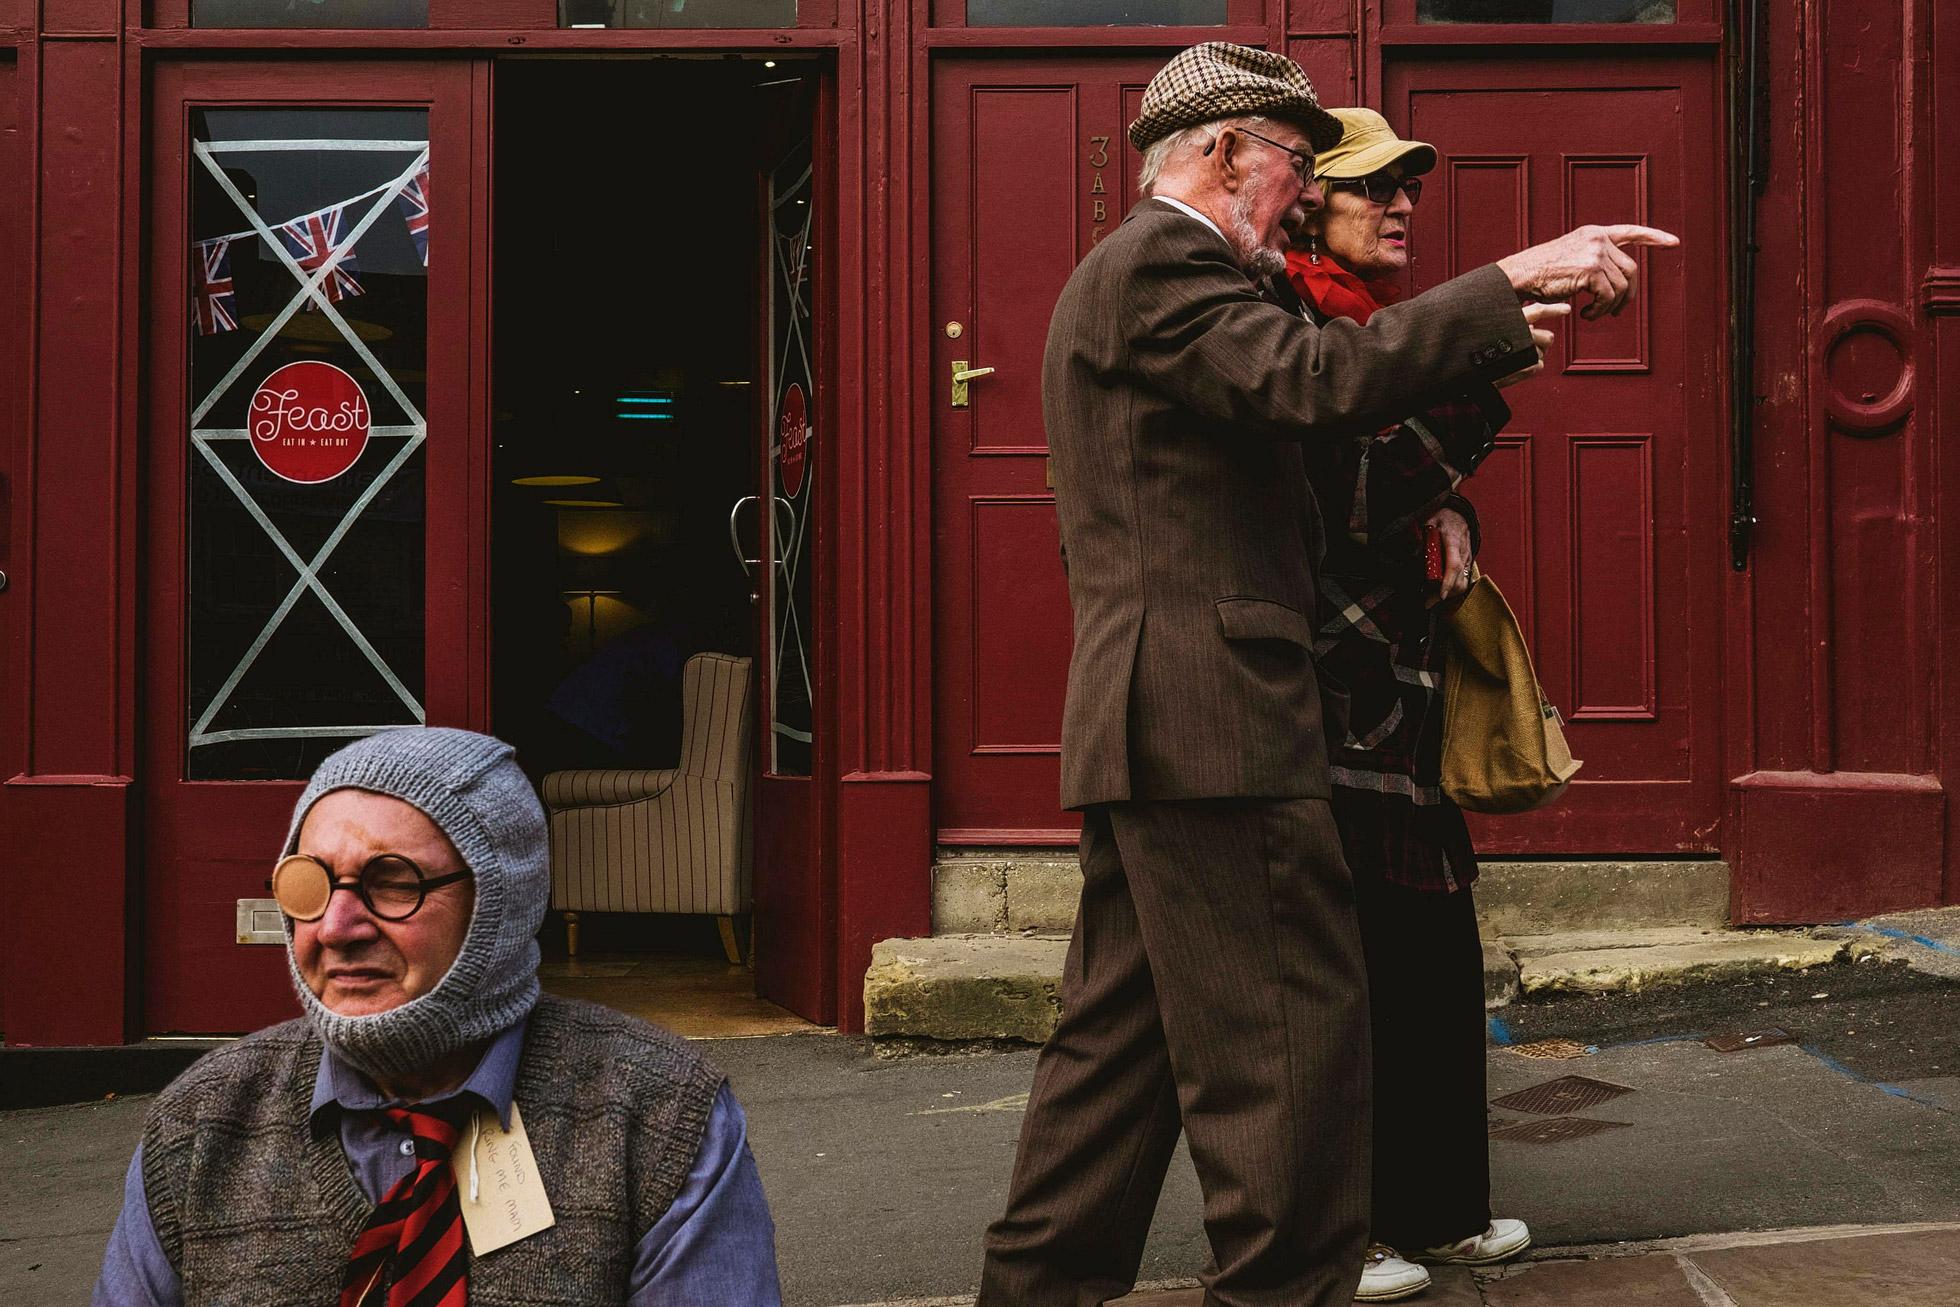 Pickering Street Photographer